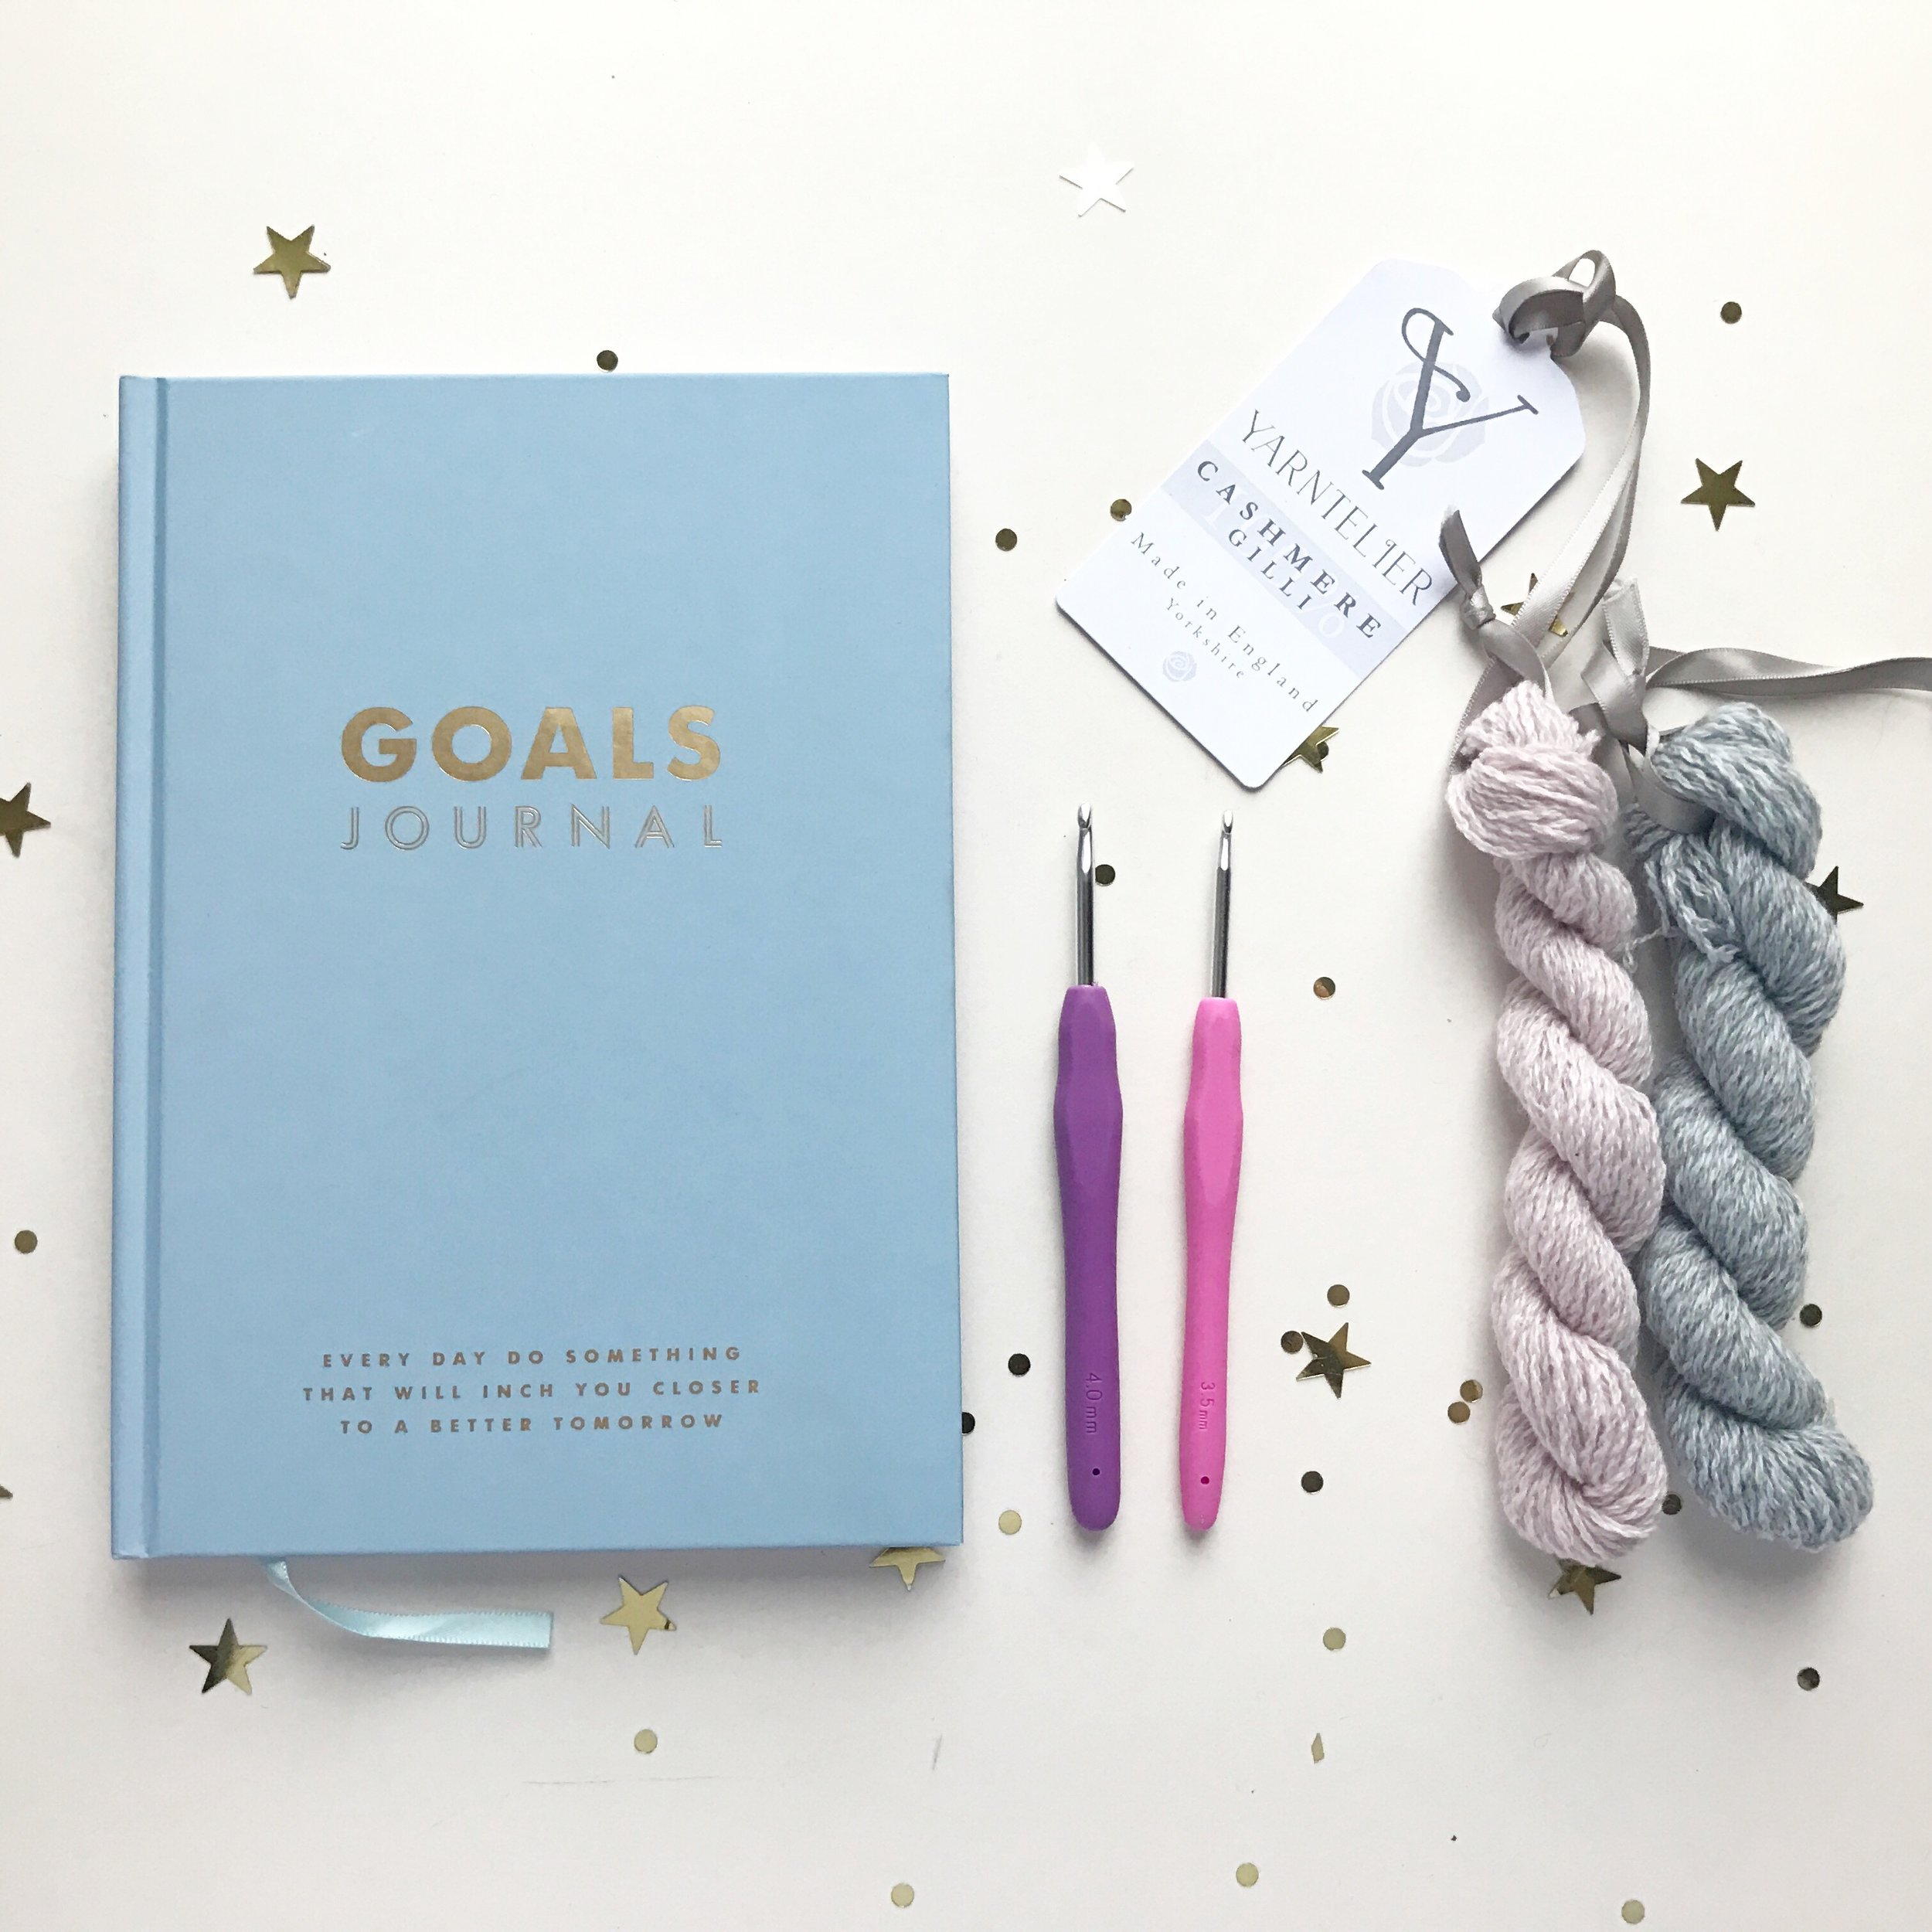 Goal Journal  Kikki-K    Crochet Hooks   Clover Amour     Cashmere Lace  Y  arntelier